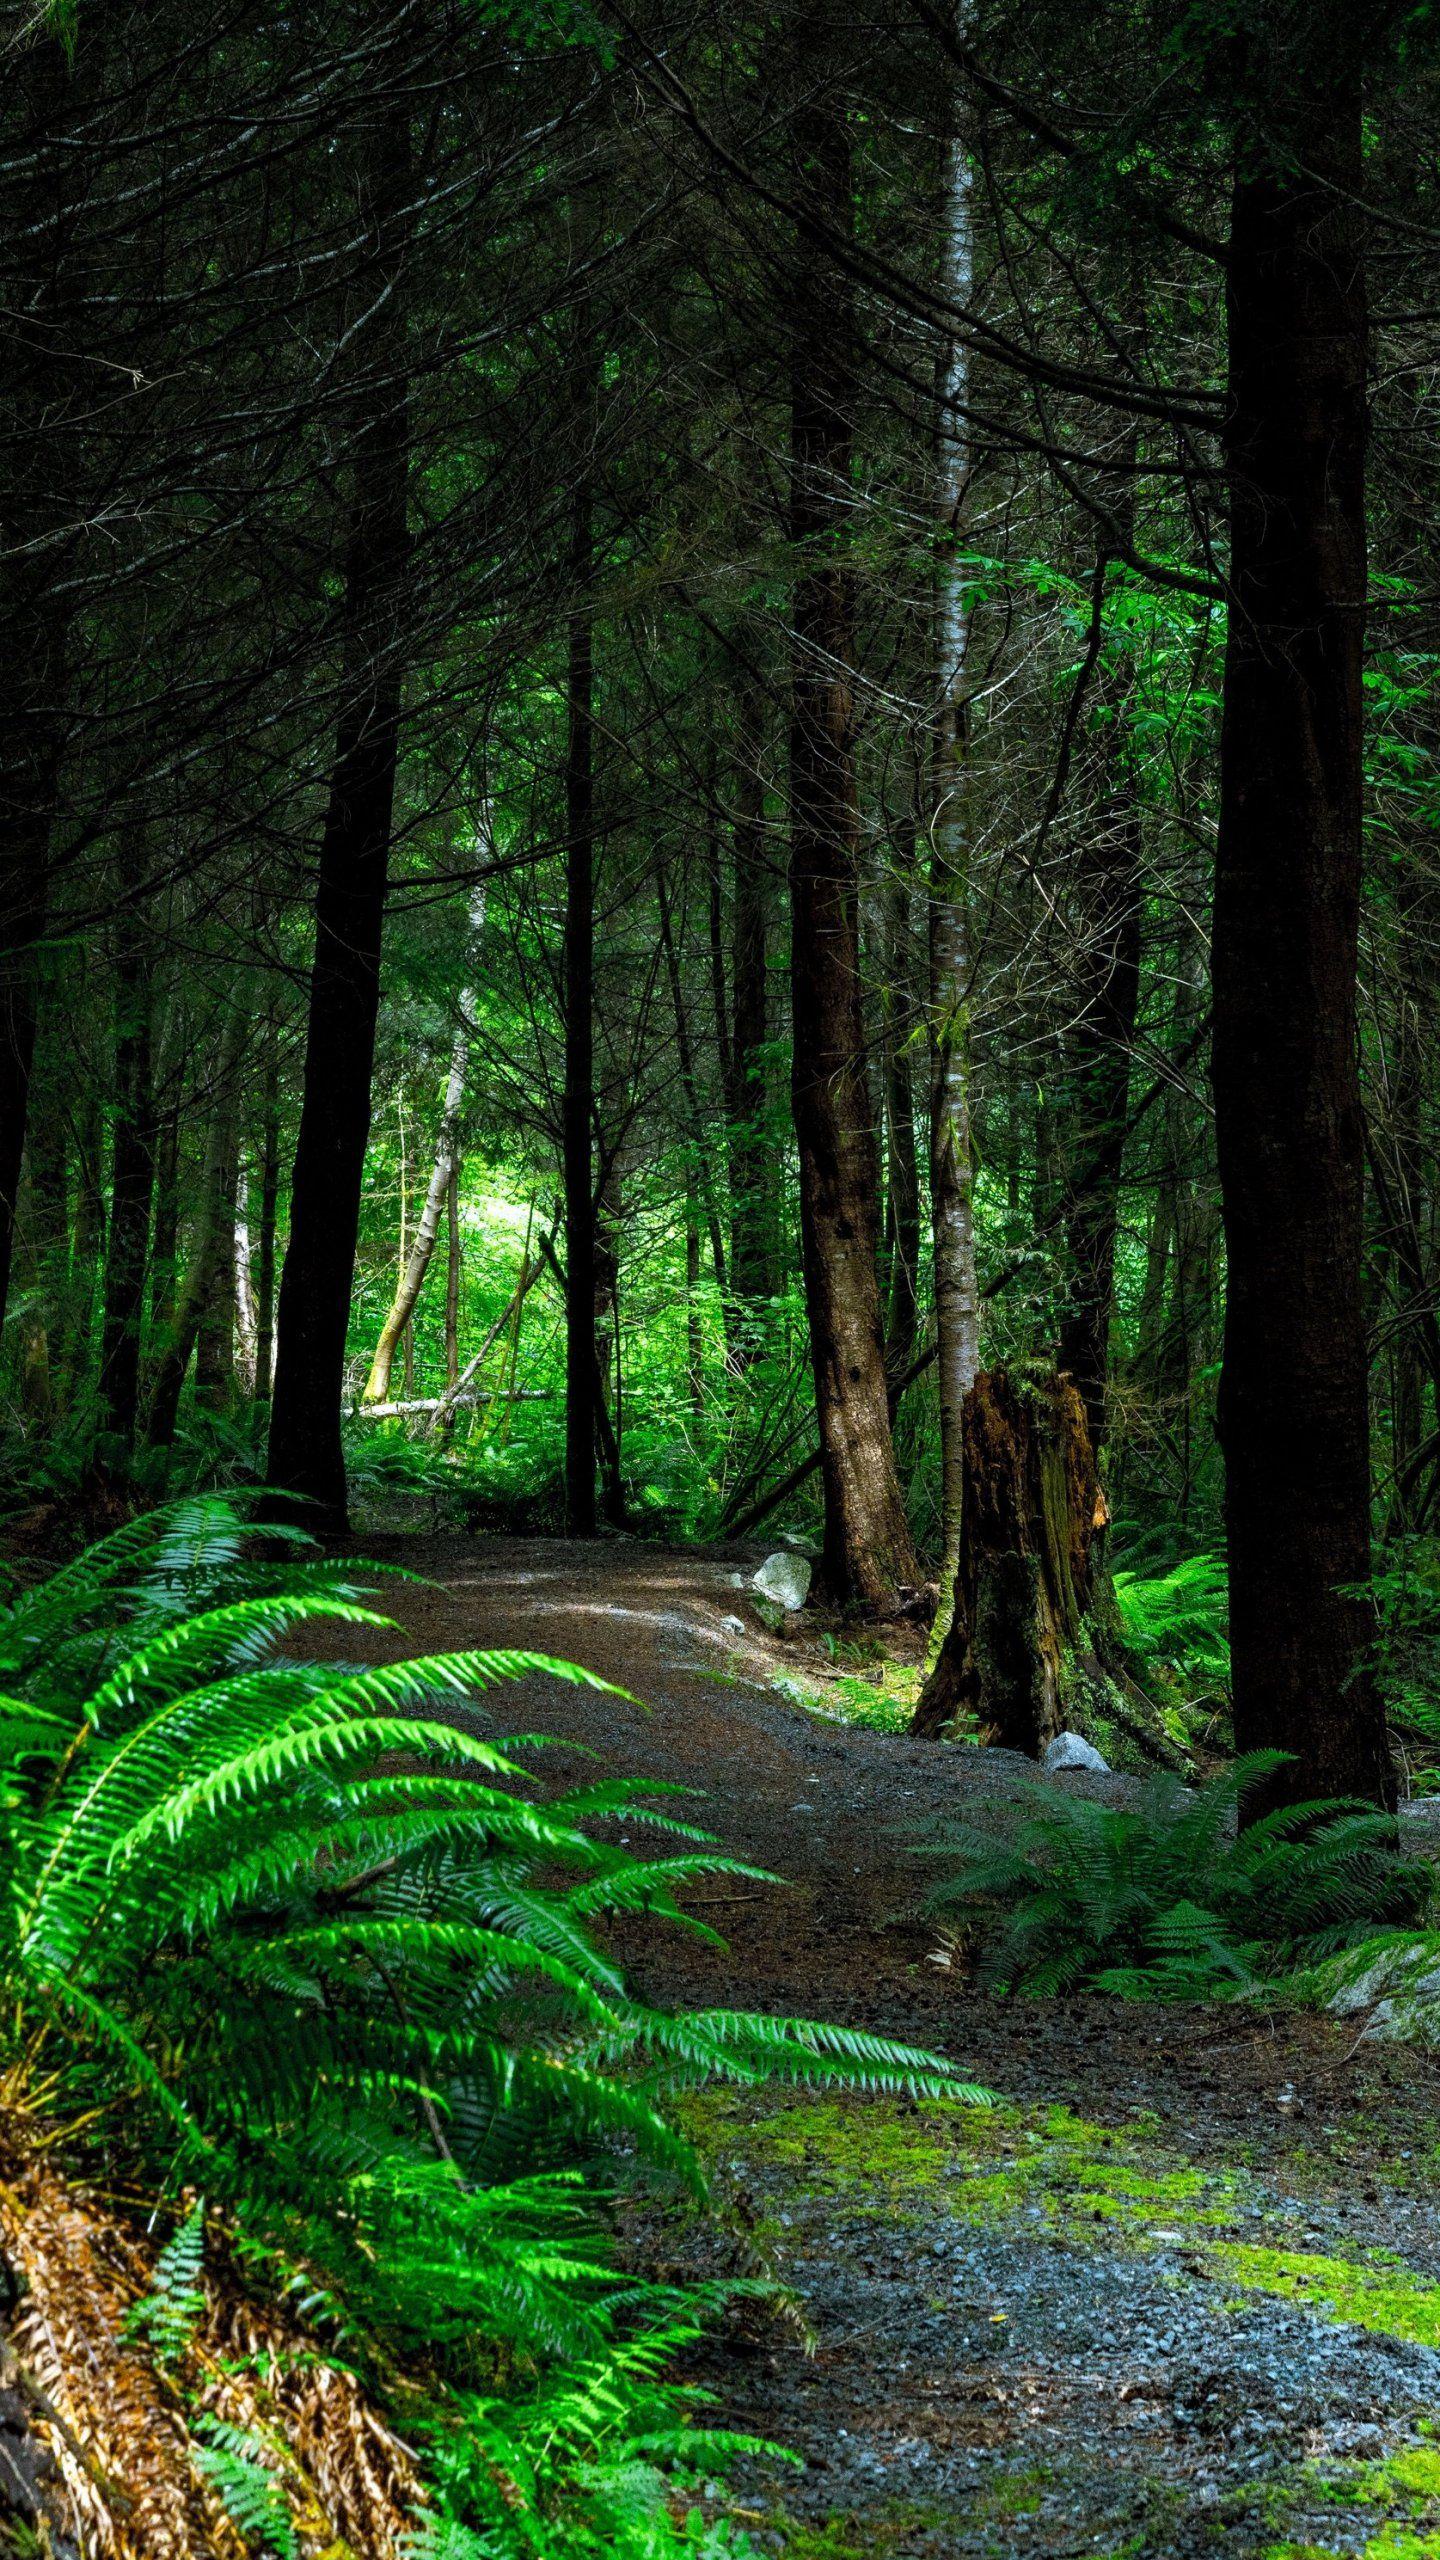 Forest Path Wallpaper Iphone Android Desktop Backgrounds Forest Path Landscape Pictures Landscape